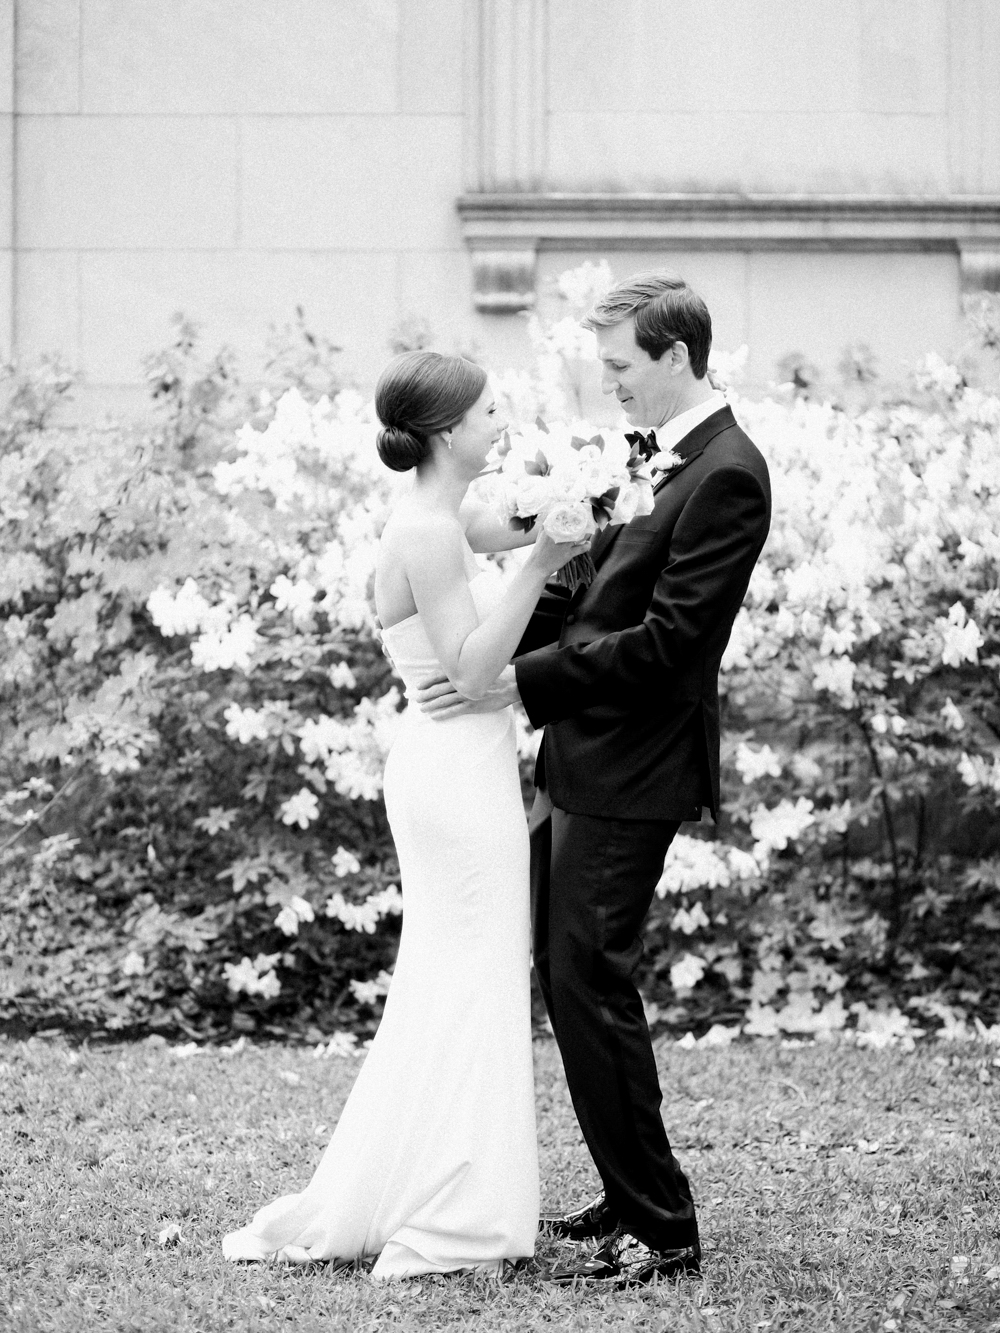 benefits of a first look_wedding photography_wedding photographer_film wedding photographer_Christine Gosch_www.christinegosch.com_Houston, Texas wedding photographer_ Houston, Texas-8.jpg